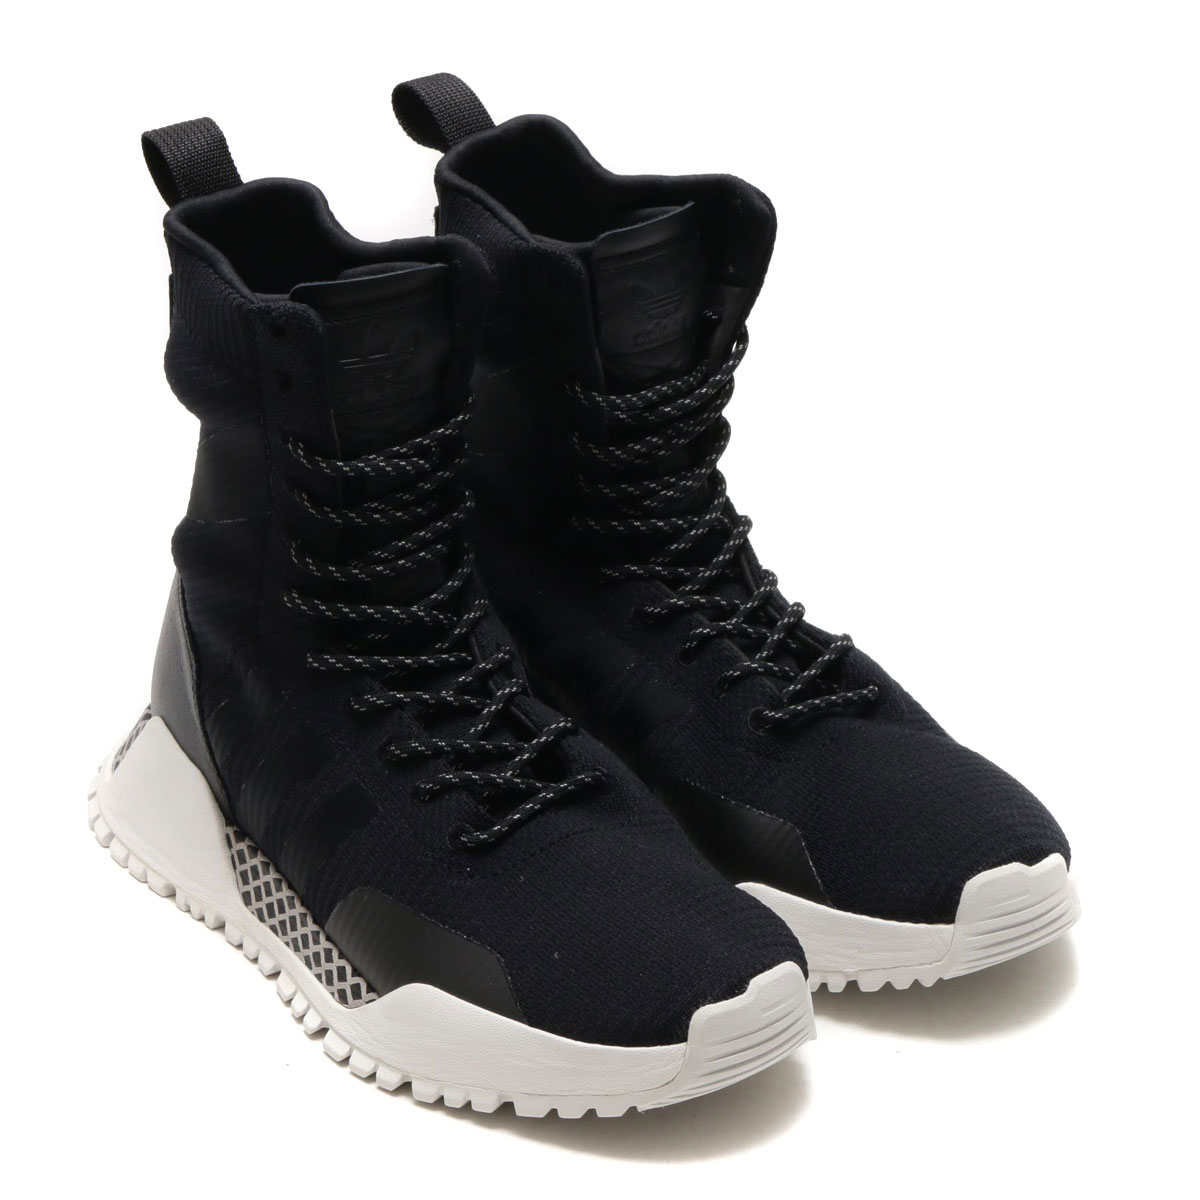 adidas Originals H.F/1.3 PK (Core Black/Core Black/Vintage White) 【メンズサイズ】【17FW-I】